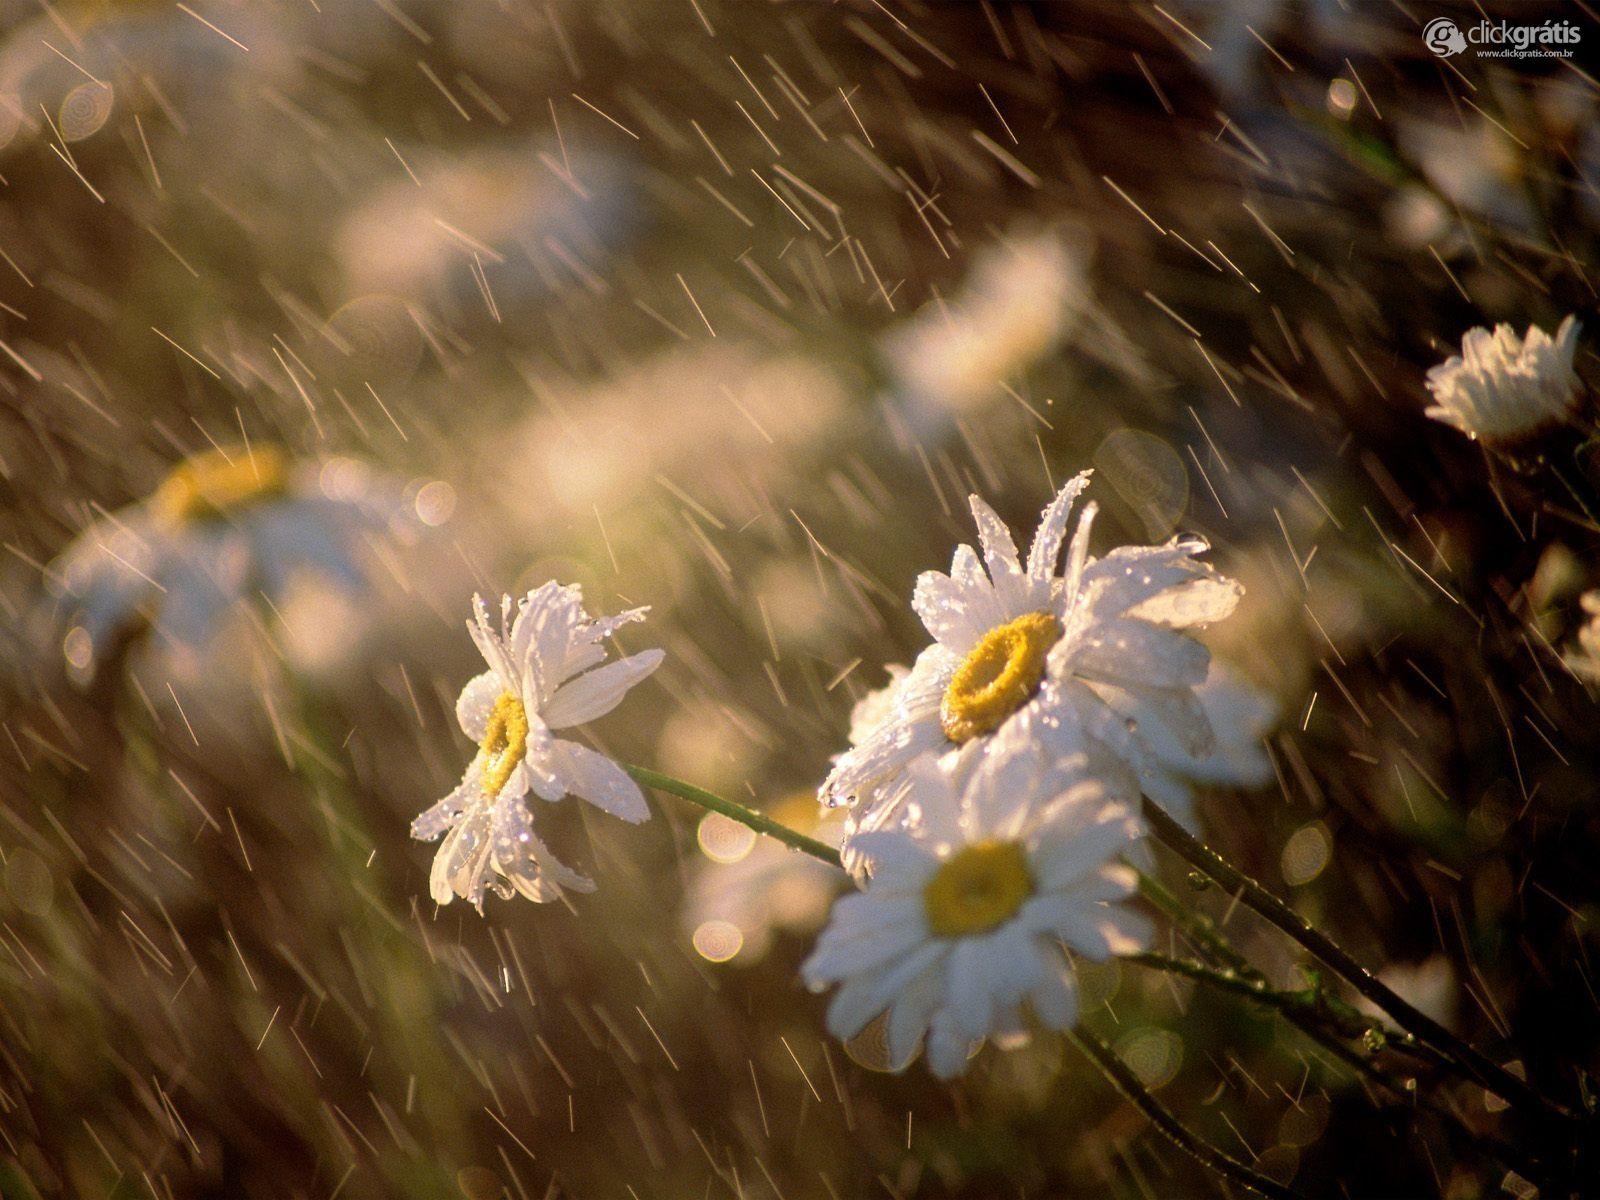 Chuva nas flores